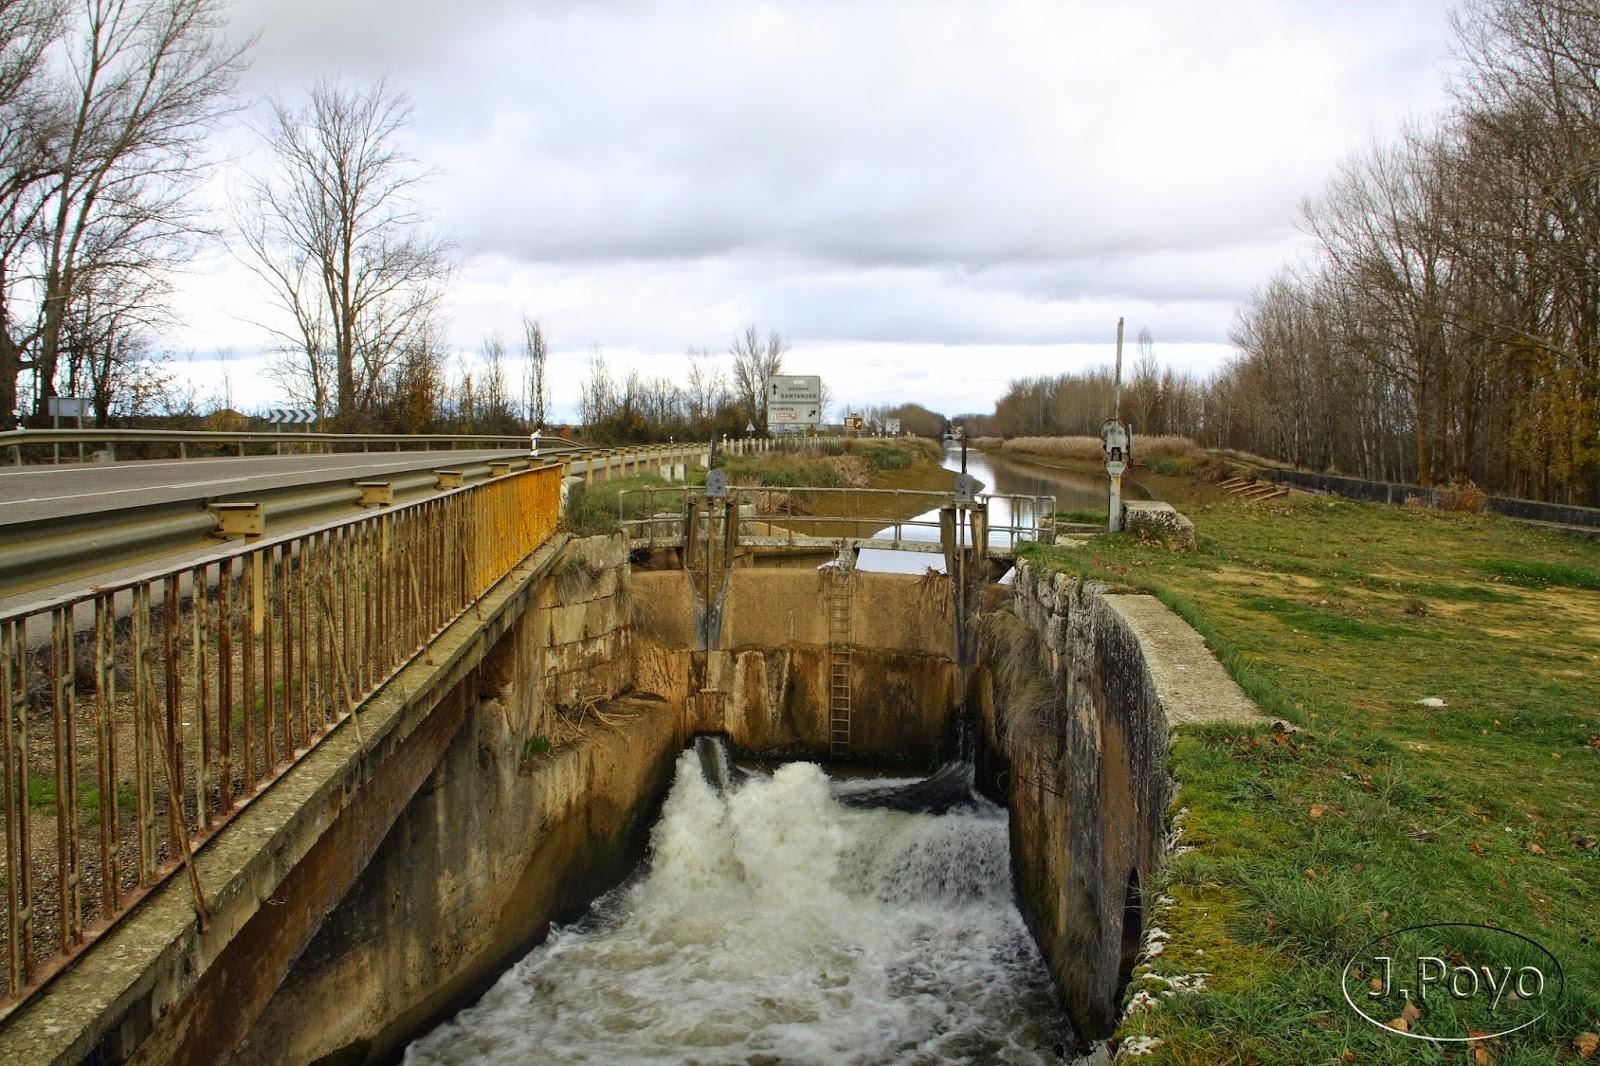 Canal de Castilla a su paso por Frómista